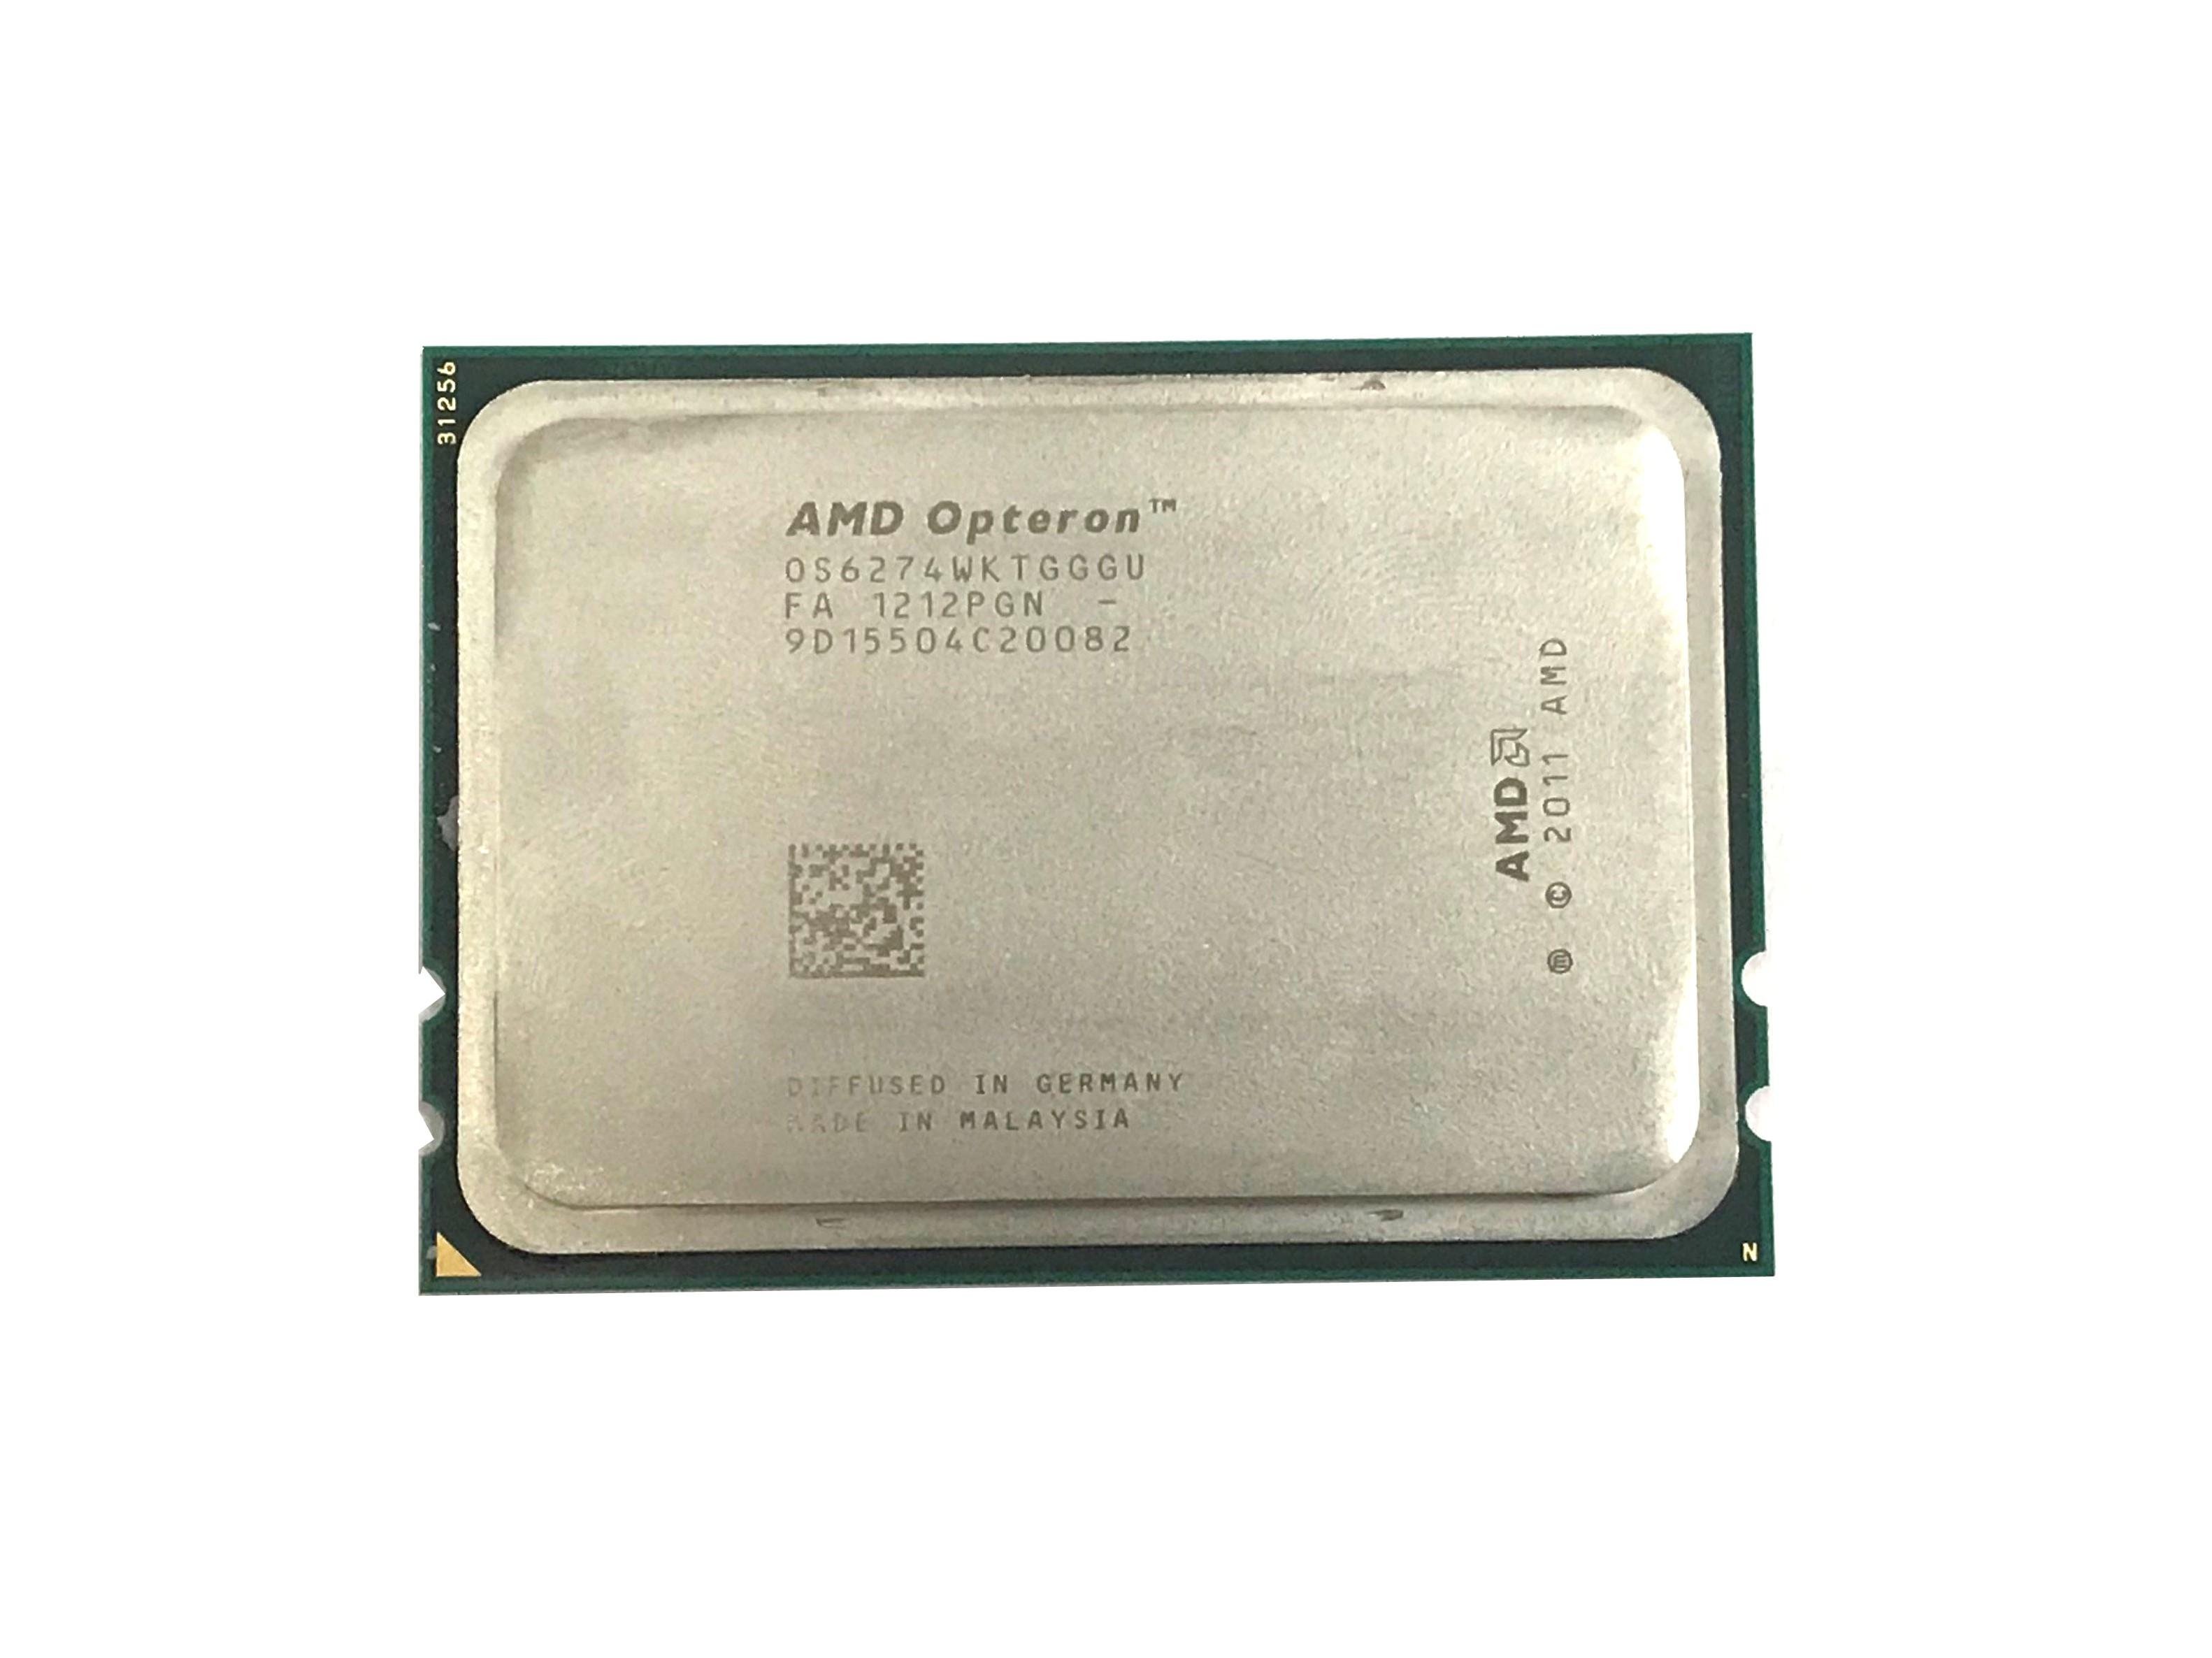 AMD Opteron 6274 2.2GHz 16Cores 16MB L3 Cache Processor (OS6274WKTGGGU)